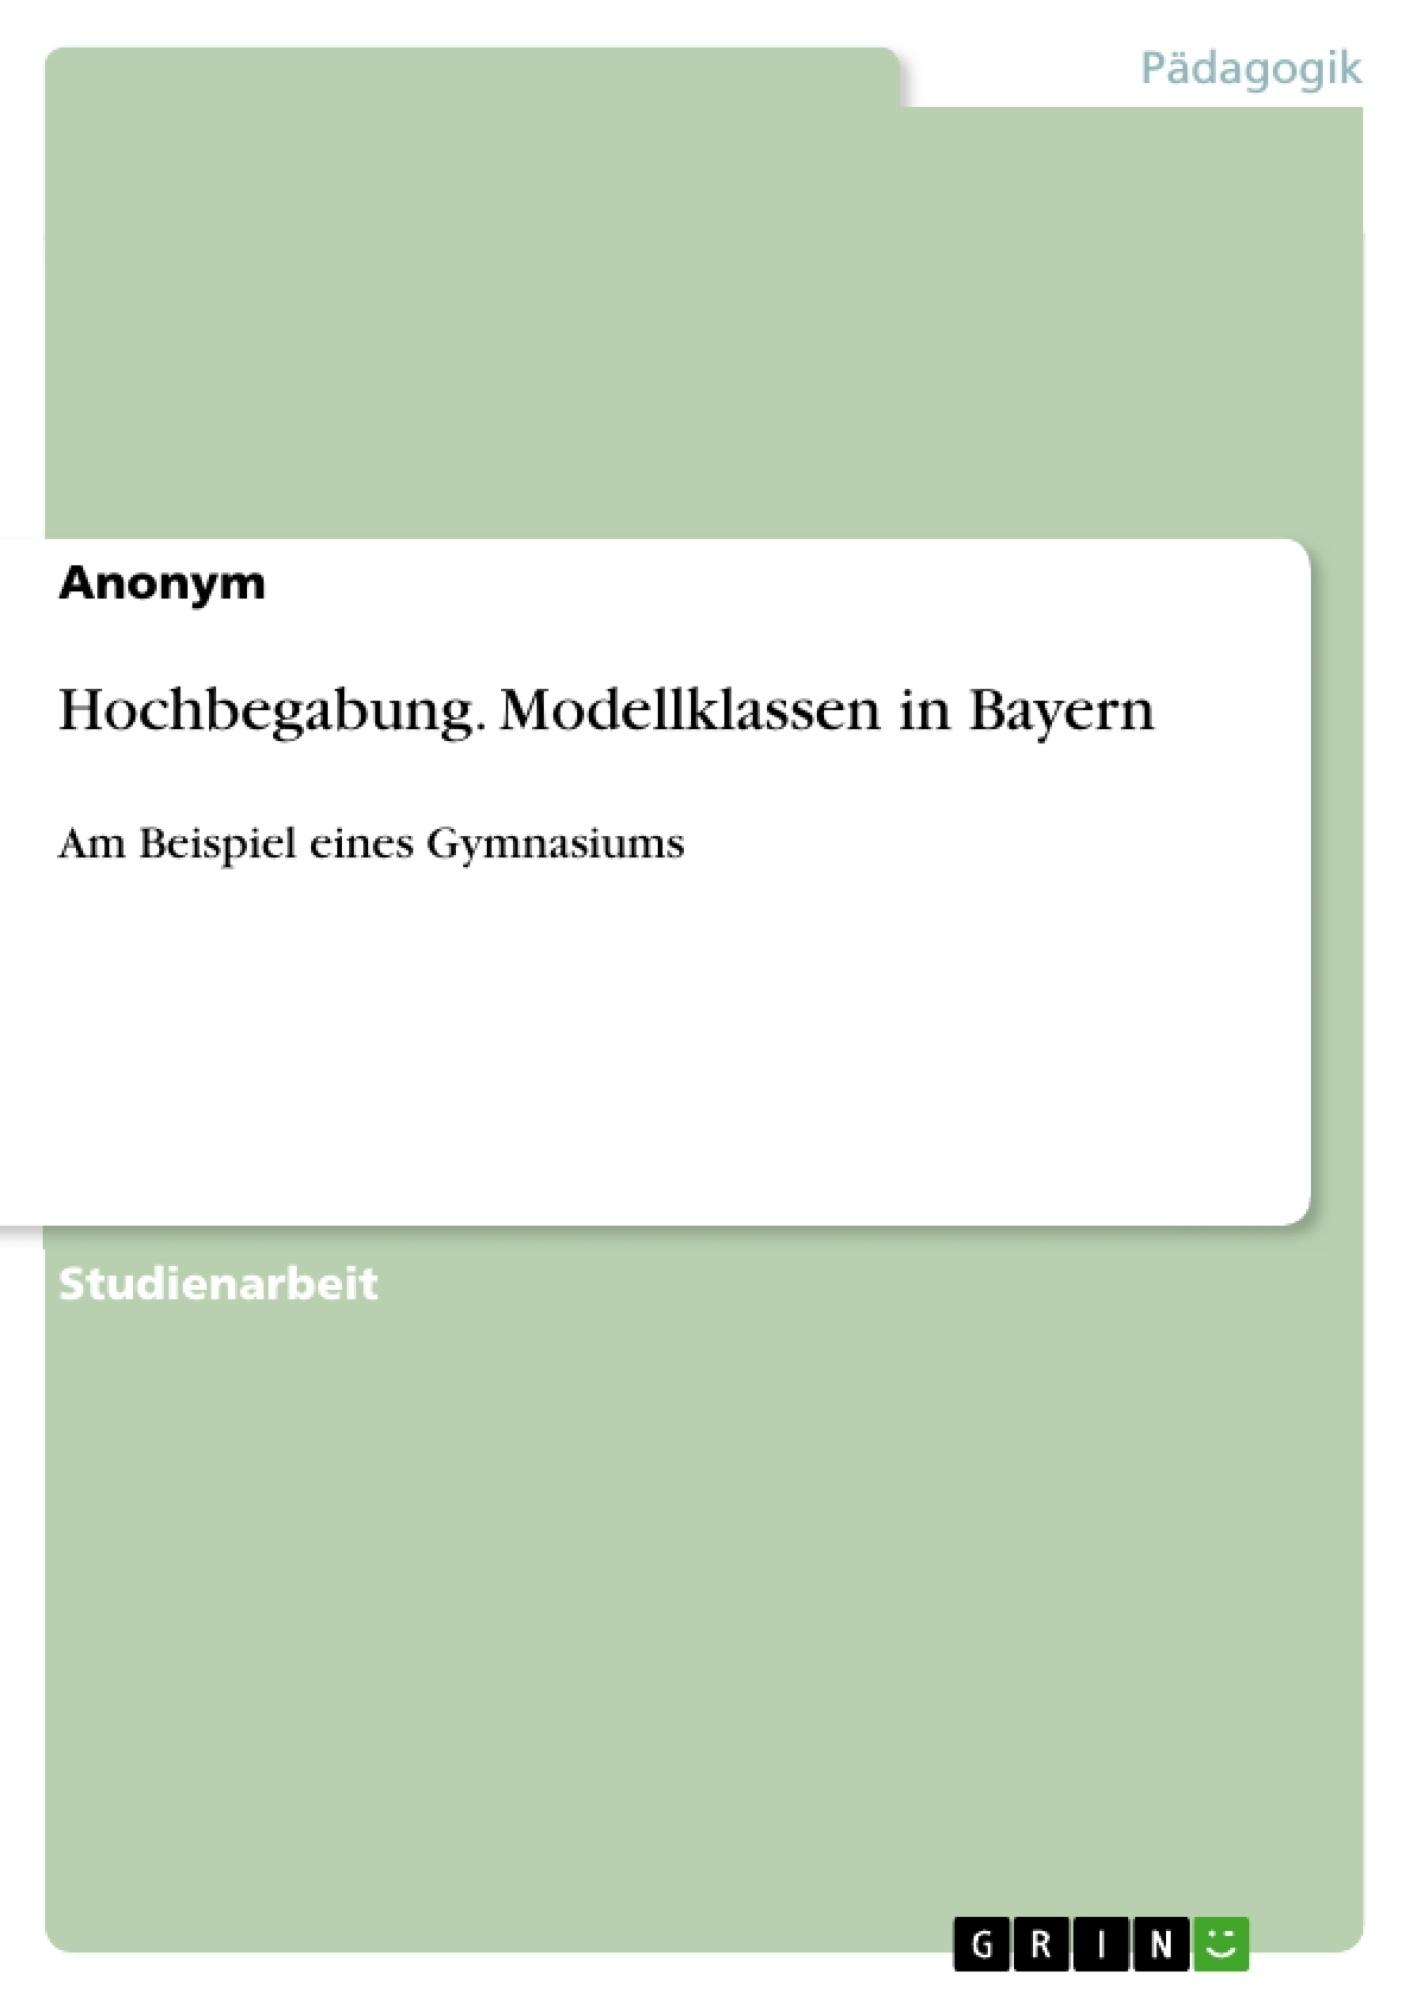 Titel: Hochbegabung. Modellklassen in Bayern